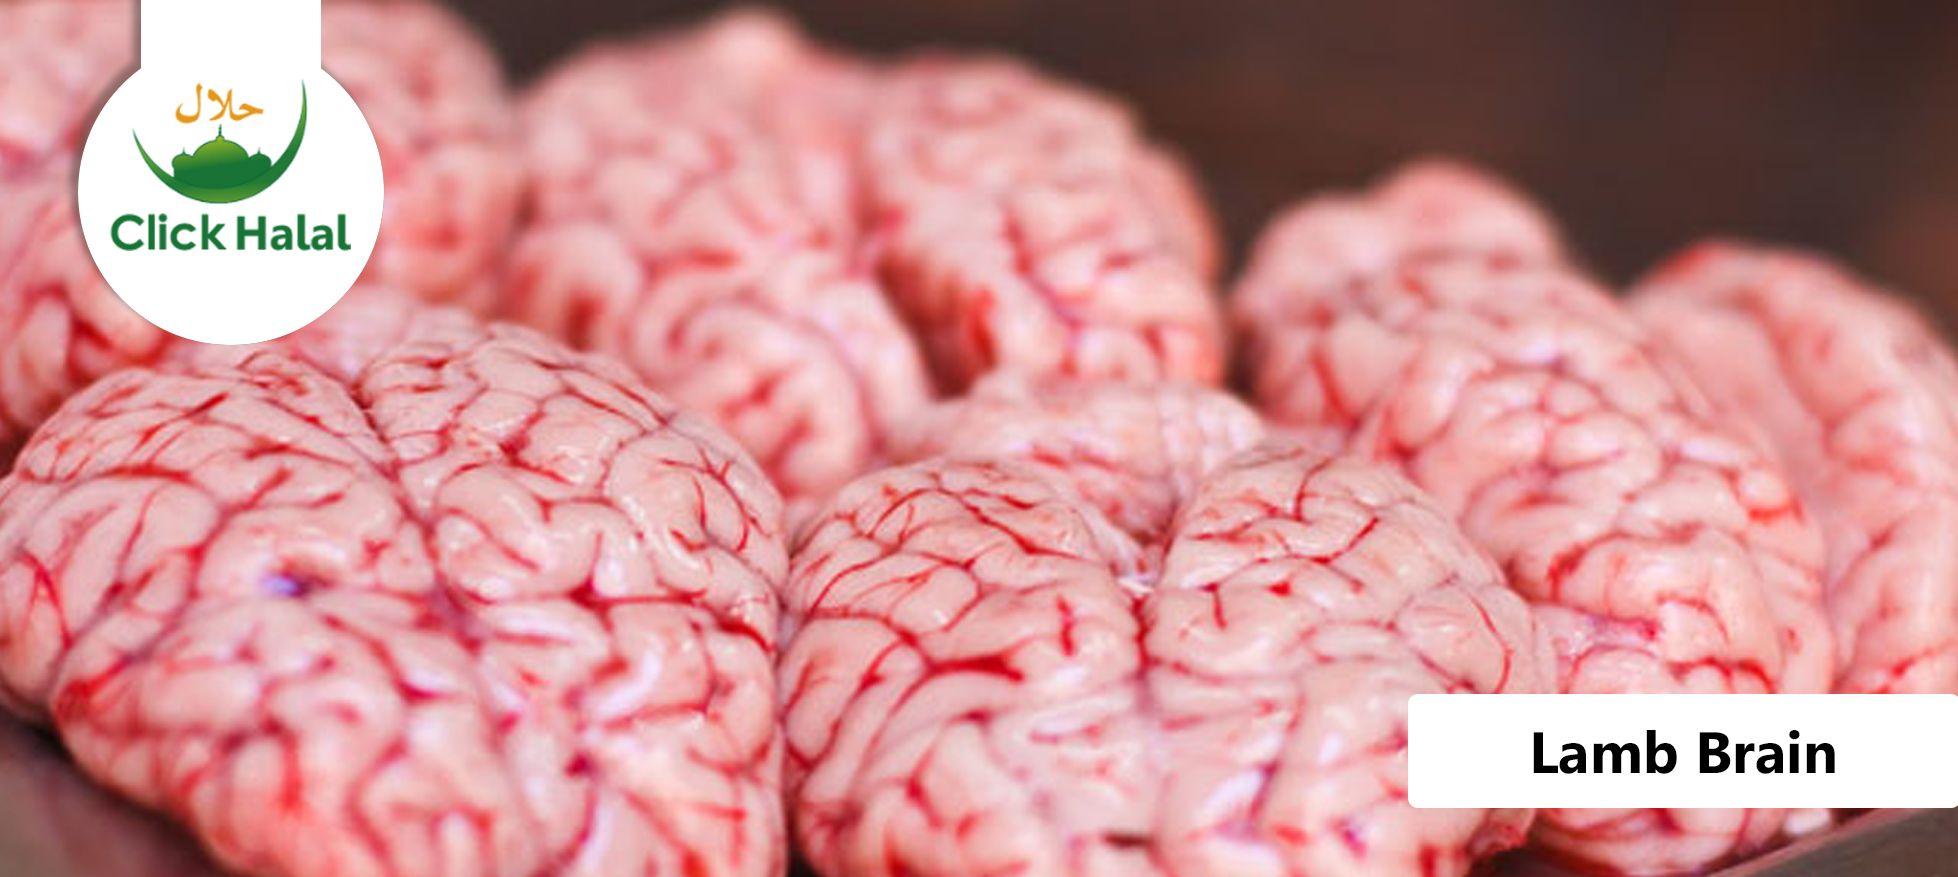 Buy Halal Meat Online Meat Online Halal Meat Delivery